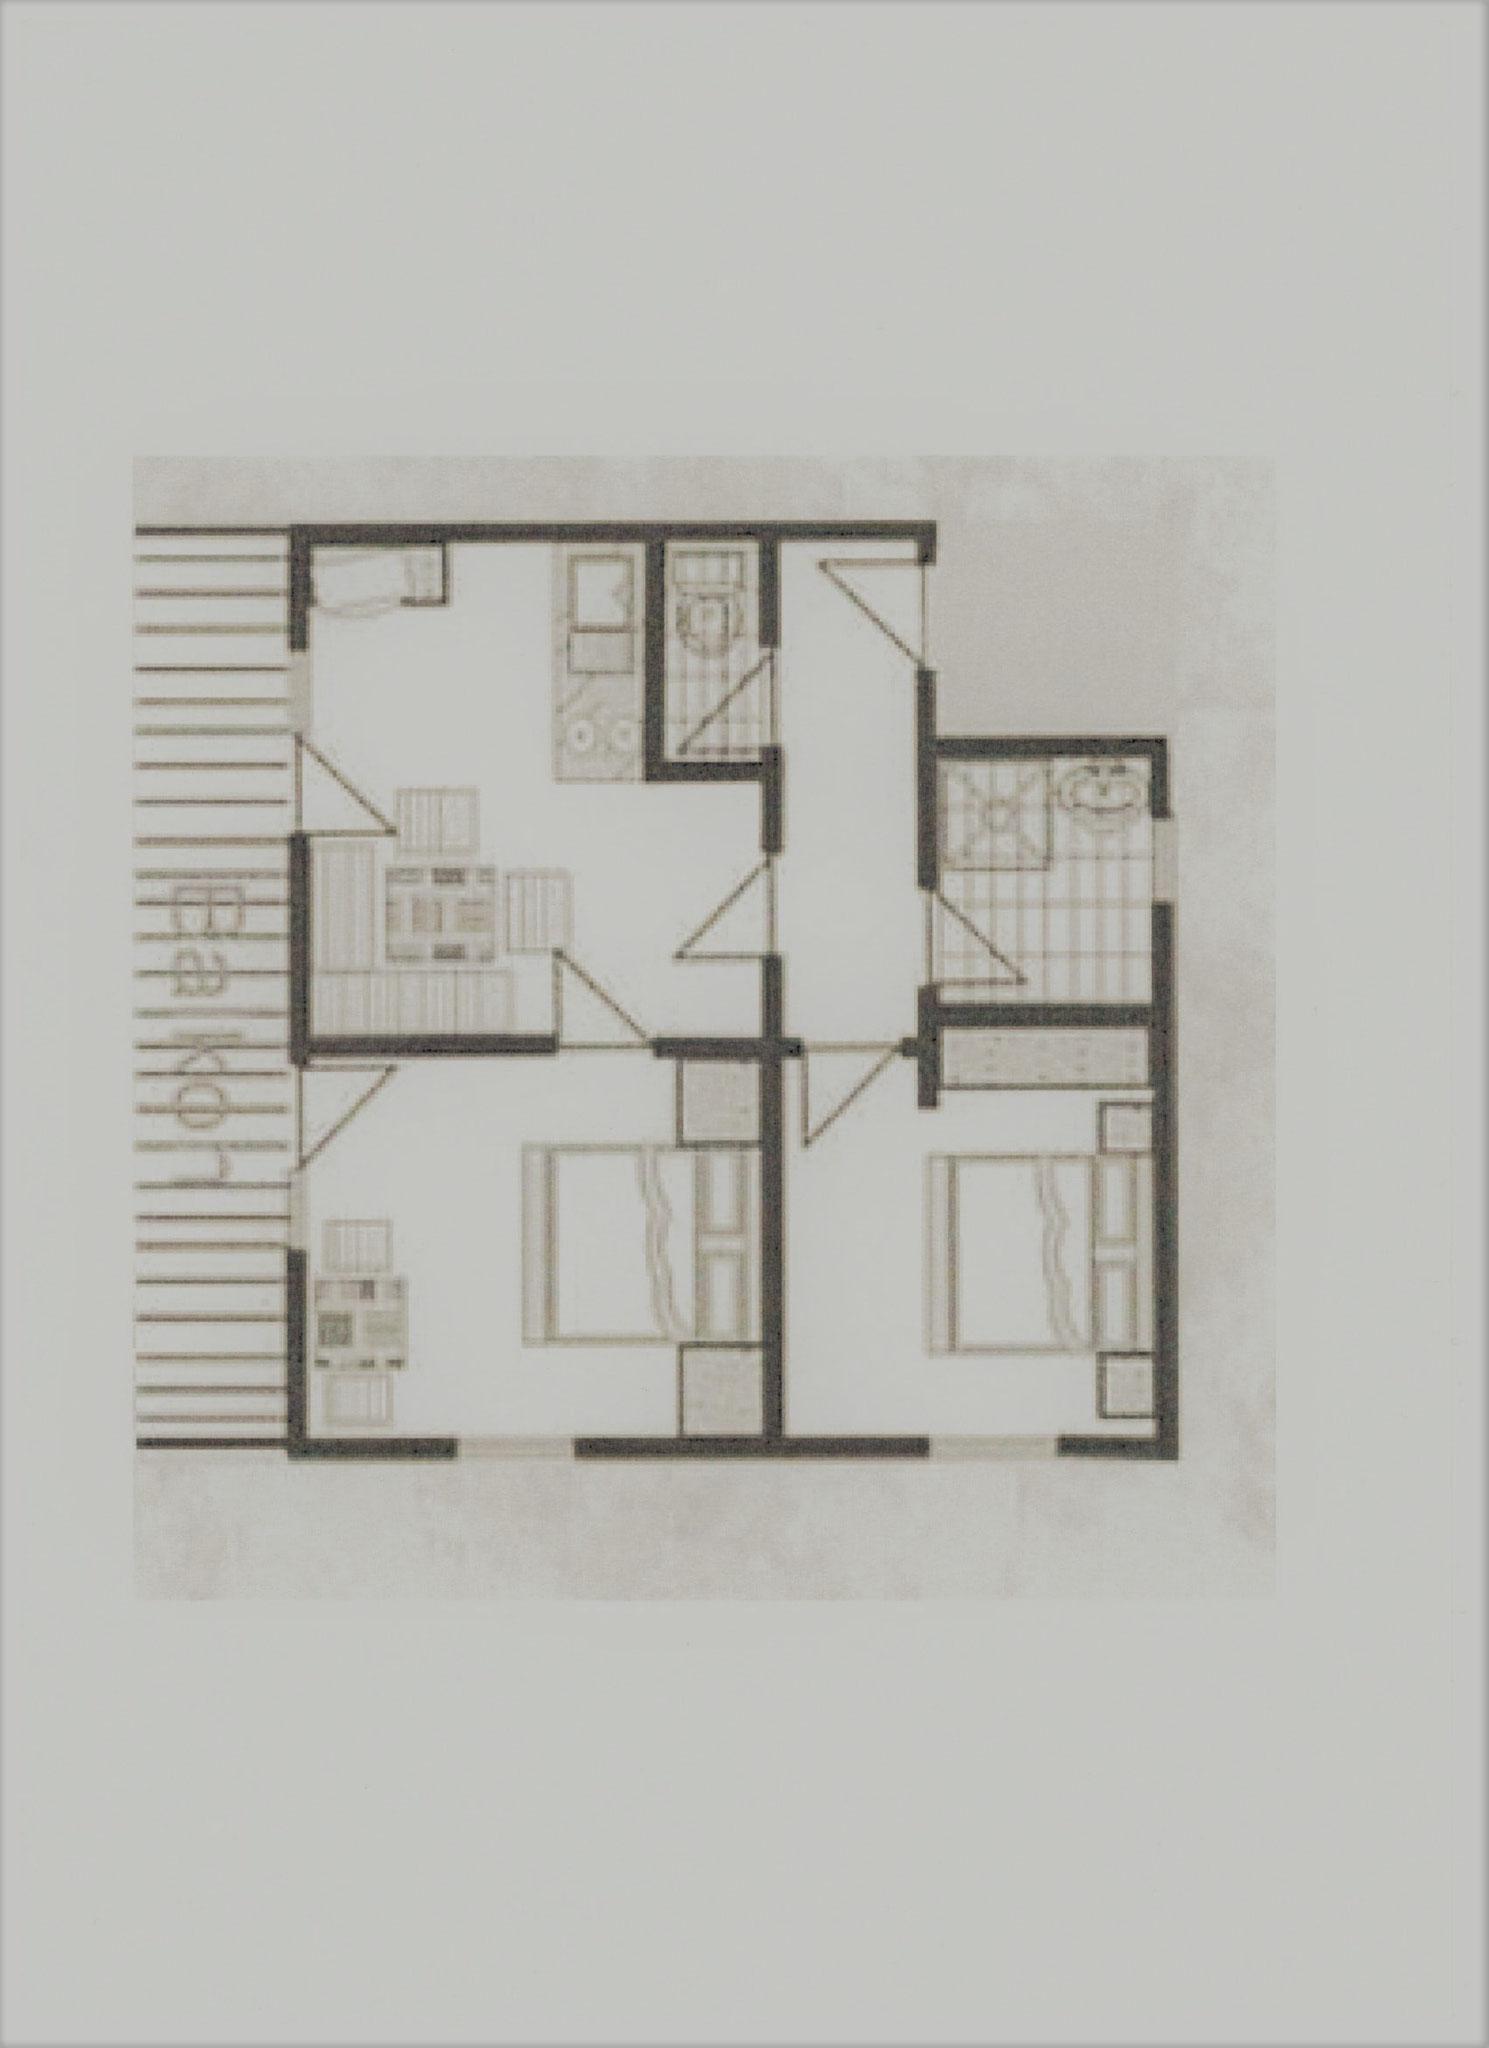 layout Apartment Enzian